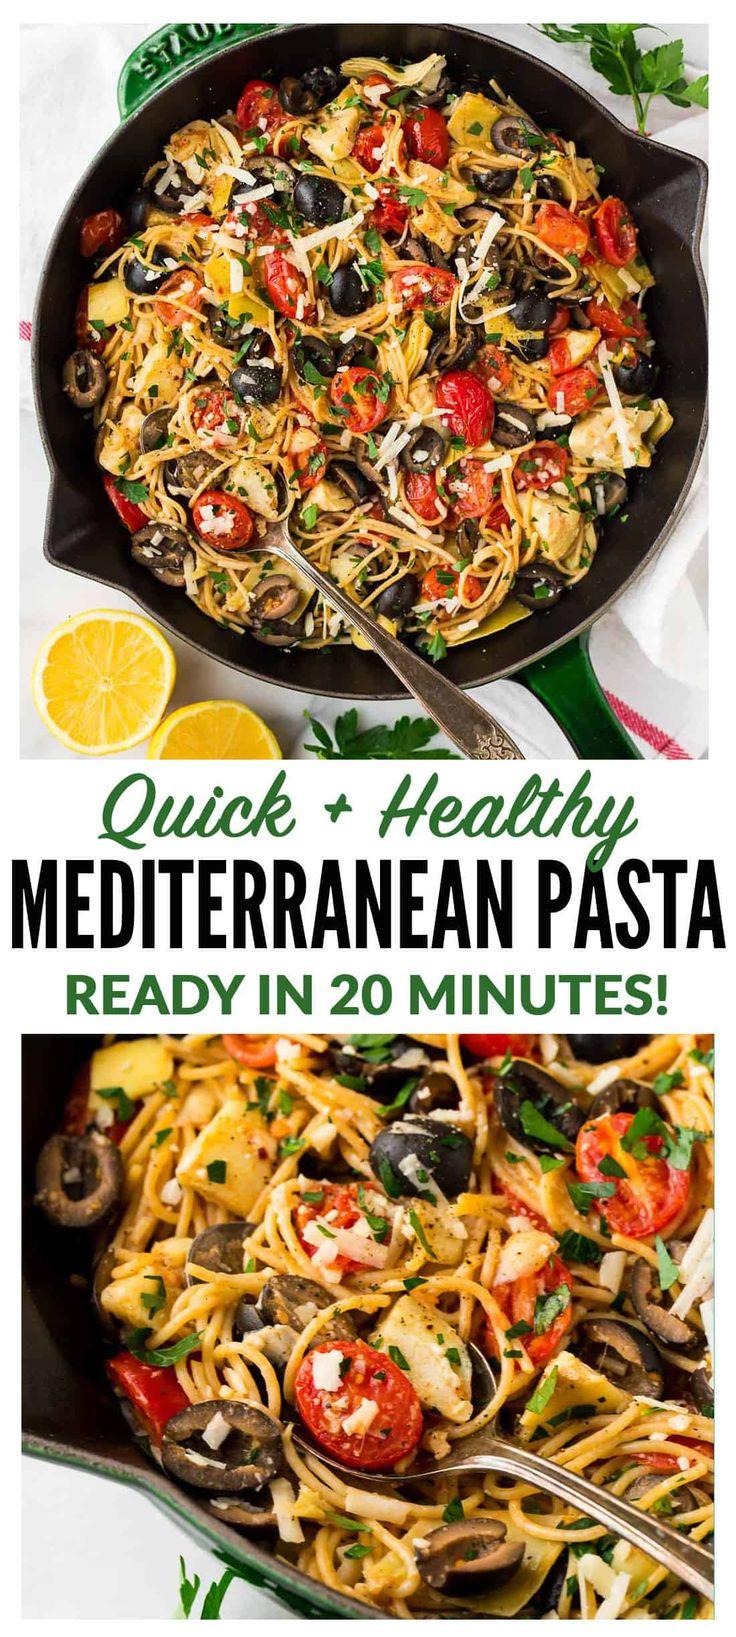 Mediterranean Pasta with artichoke, tomato, garlic, and lemon. One of our favori…